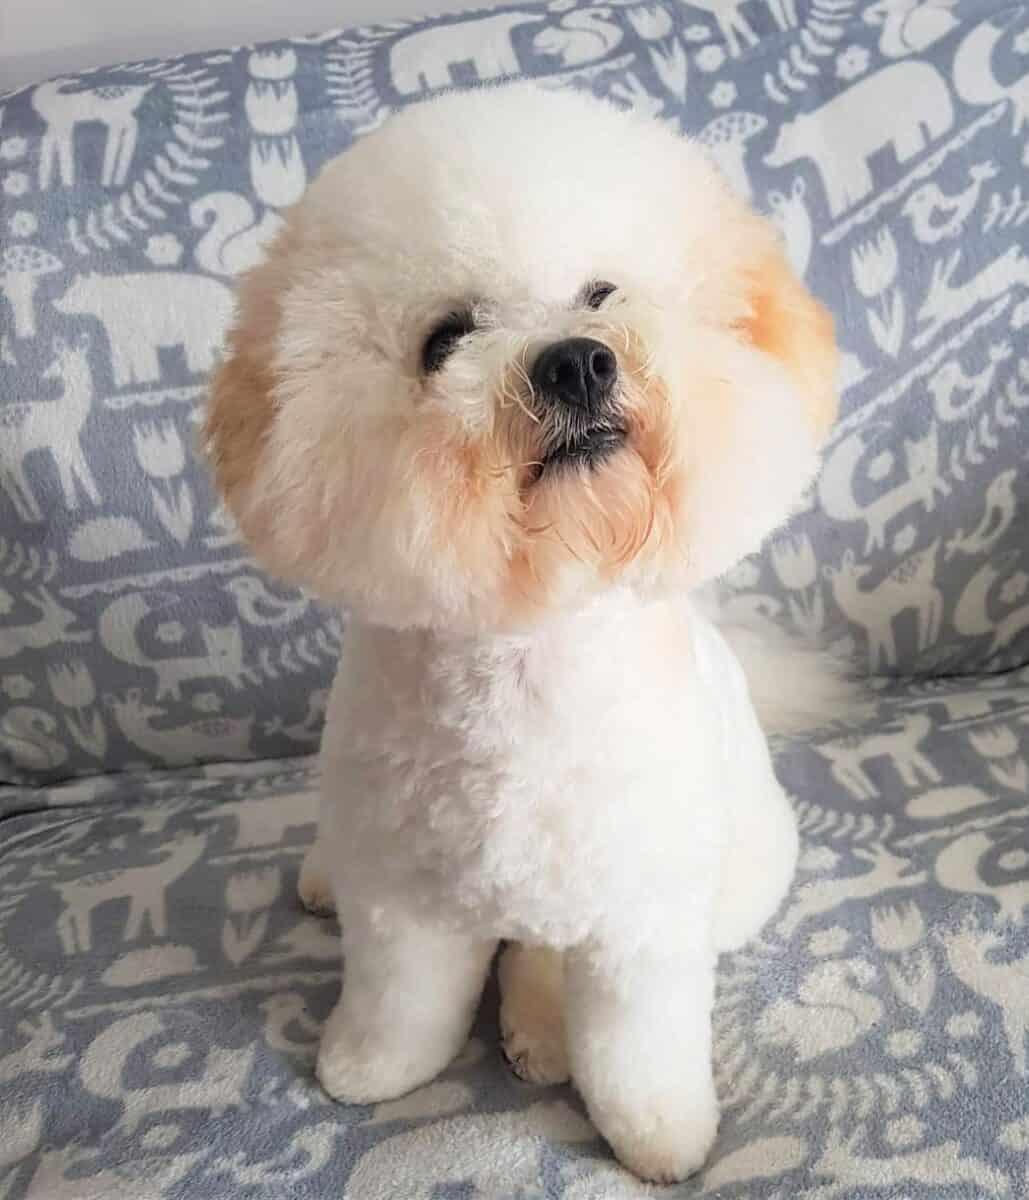 White and apricot Bichon Frise puppy